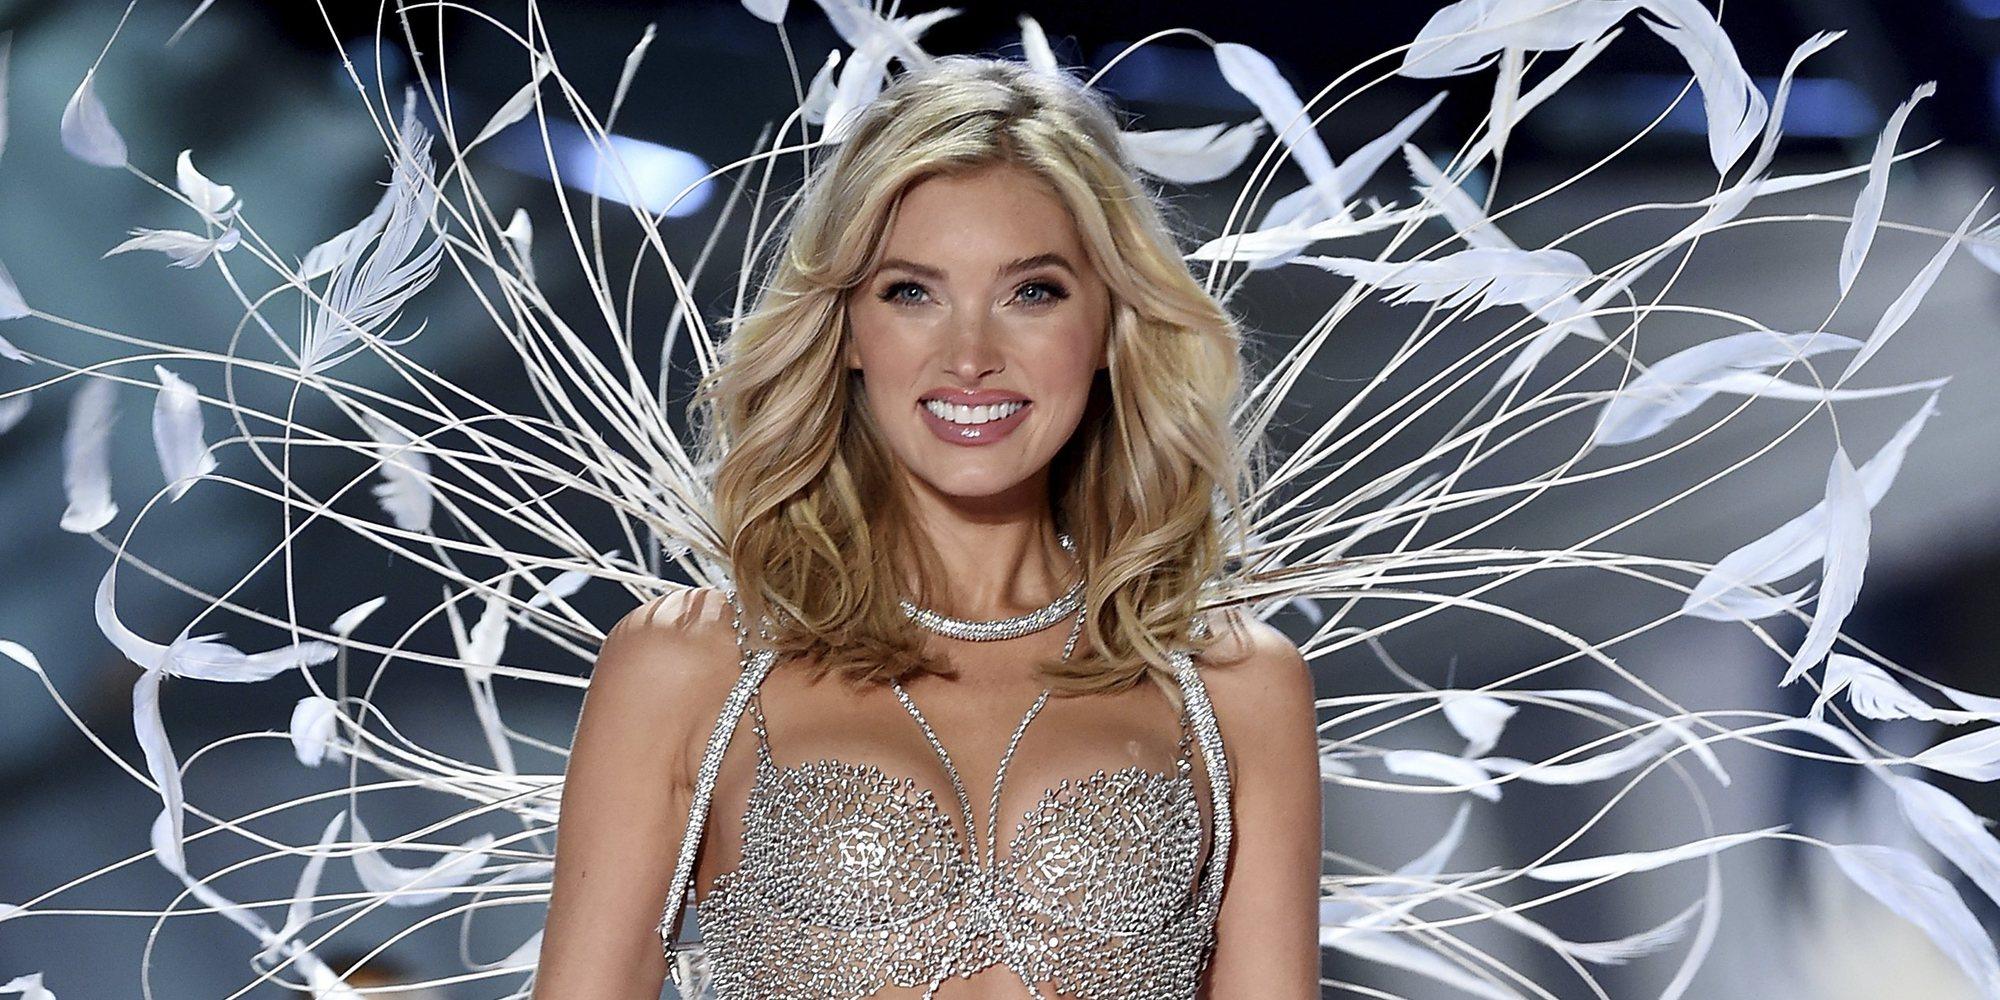 El ángel de Victoria's Secret, Elsa Hosk, anuncia su primer embarazo